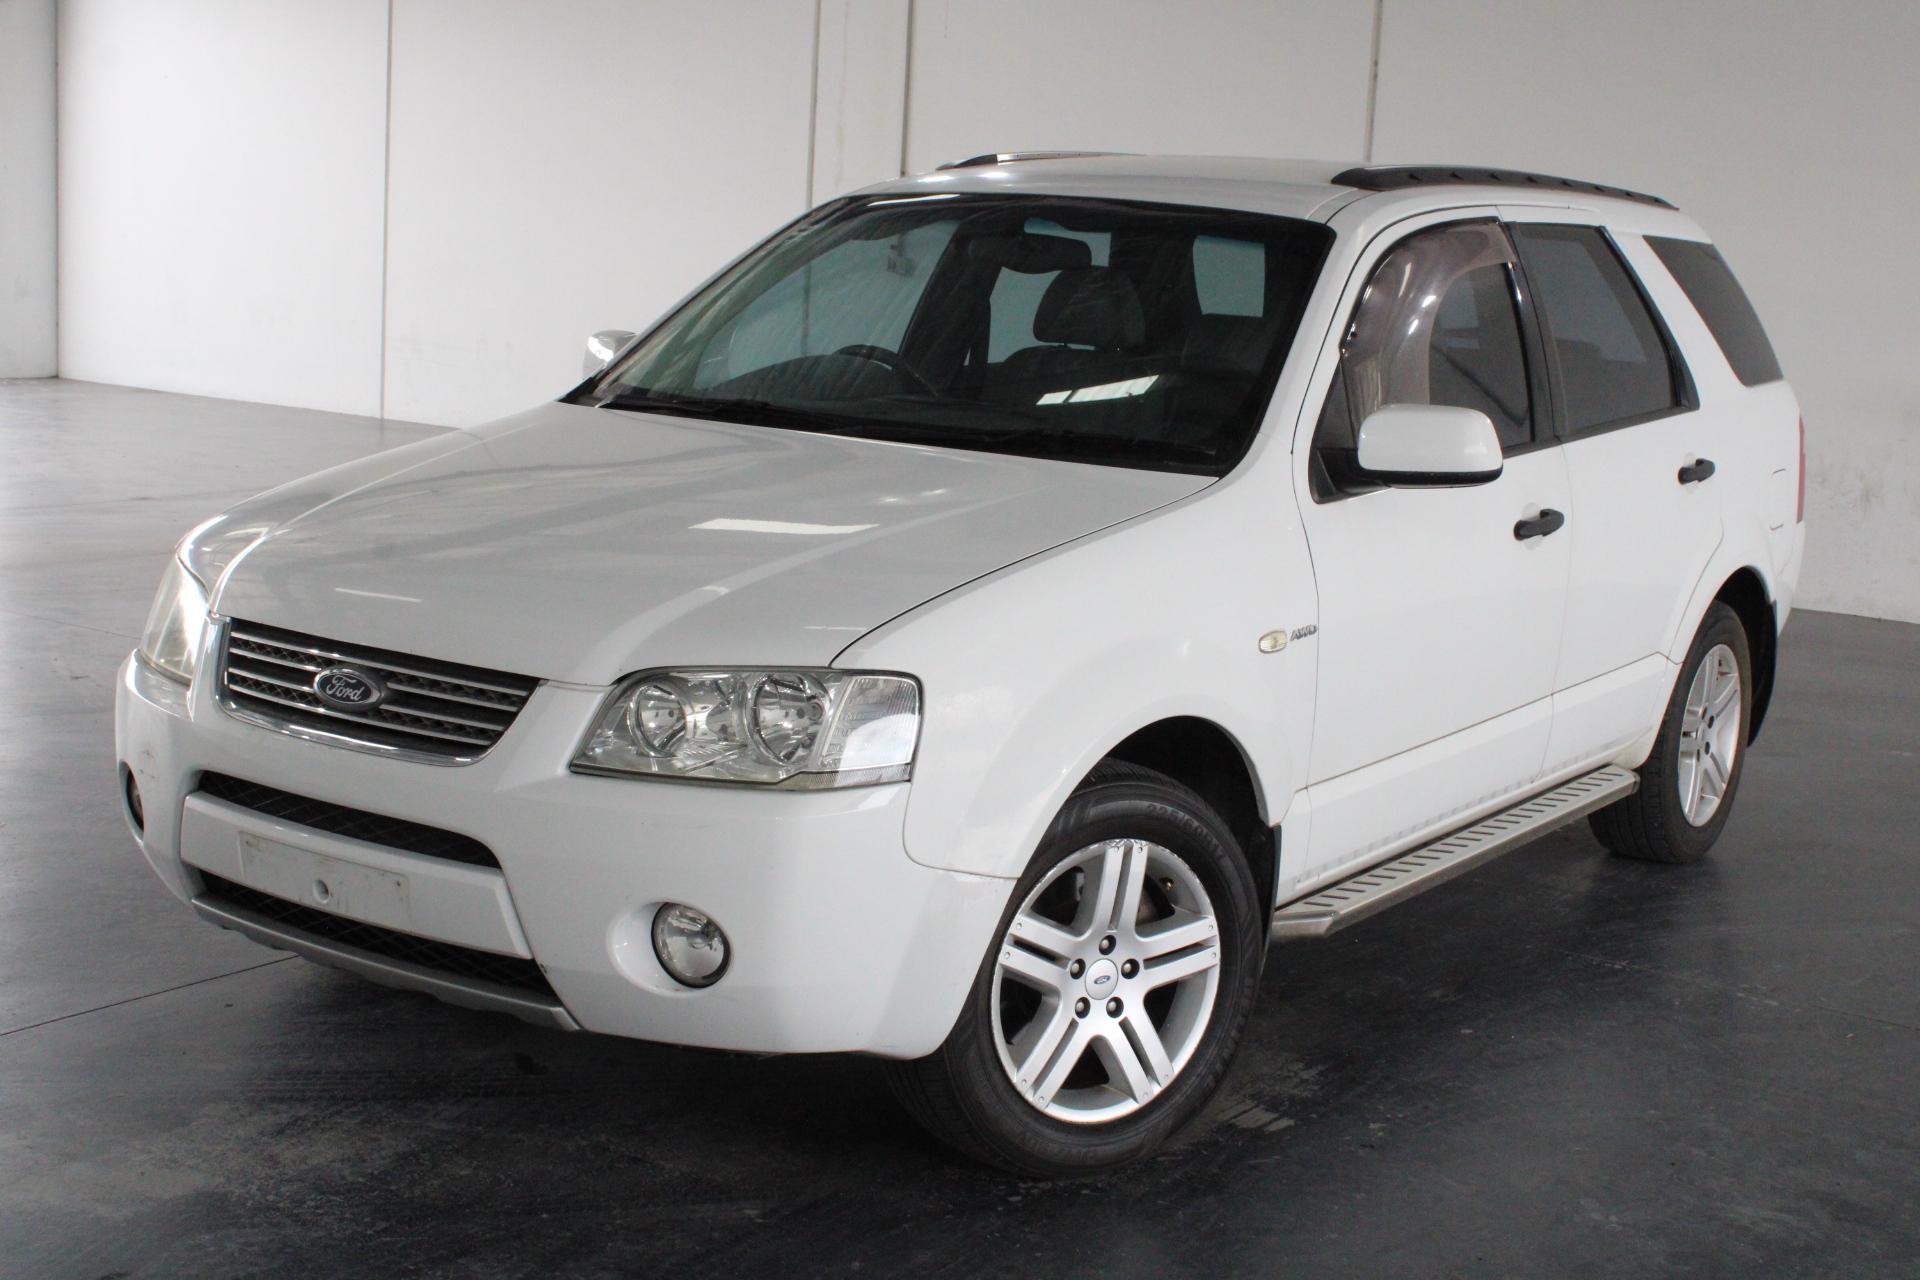 2004 Ford Territory Ghia (4x4) SX Automatic 7 Seats Wagon